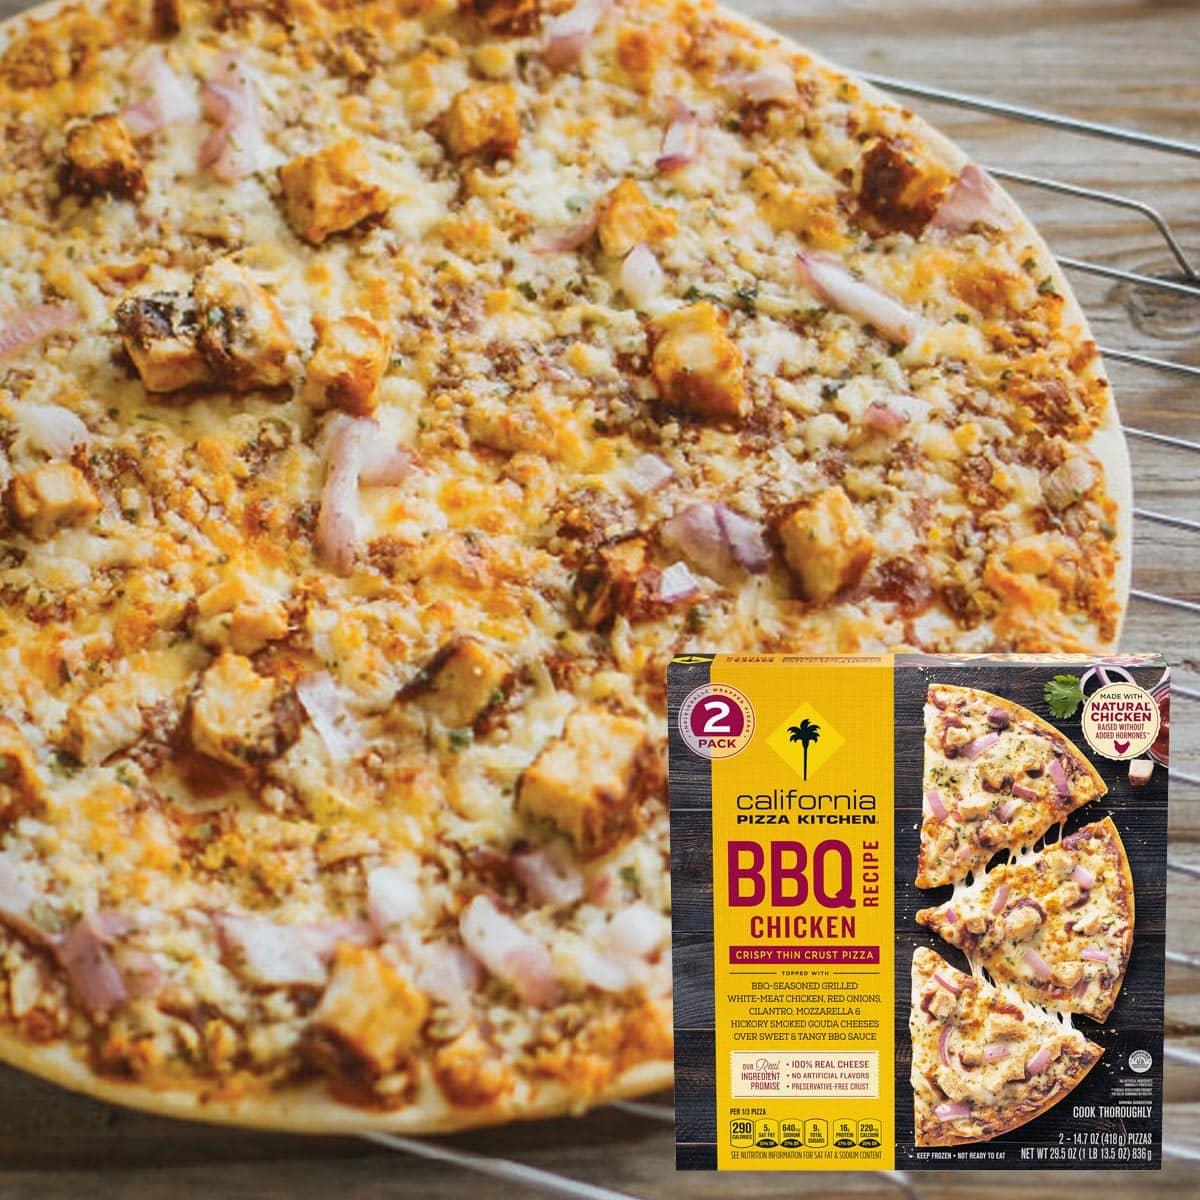 California Pizza Kitchen BBQ Chicken Crispy Thin Crust Pizza Plated Feature